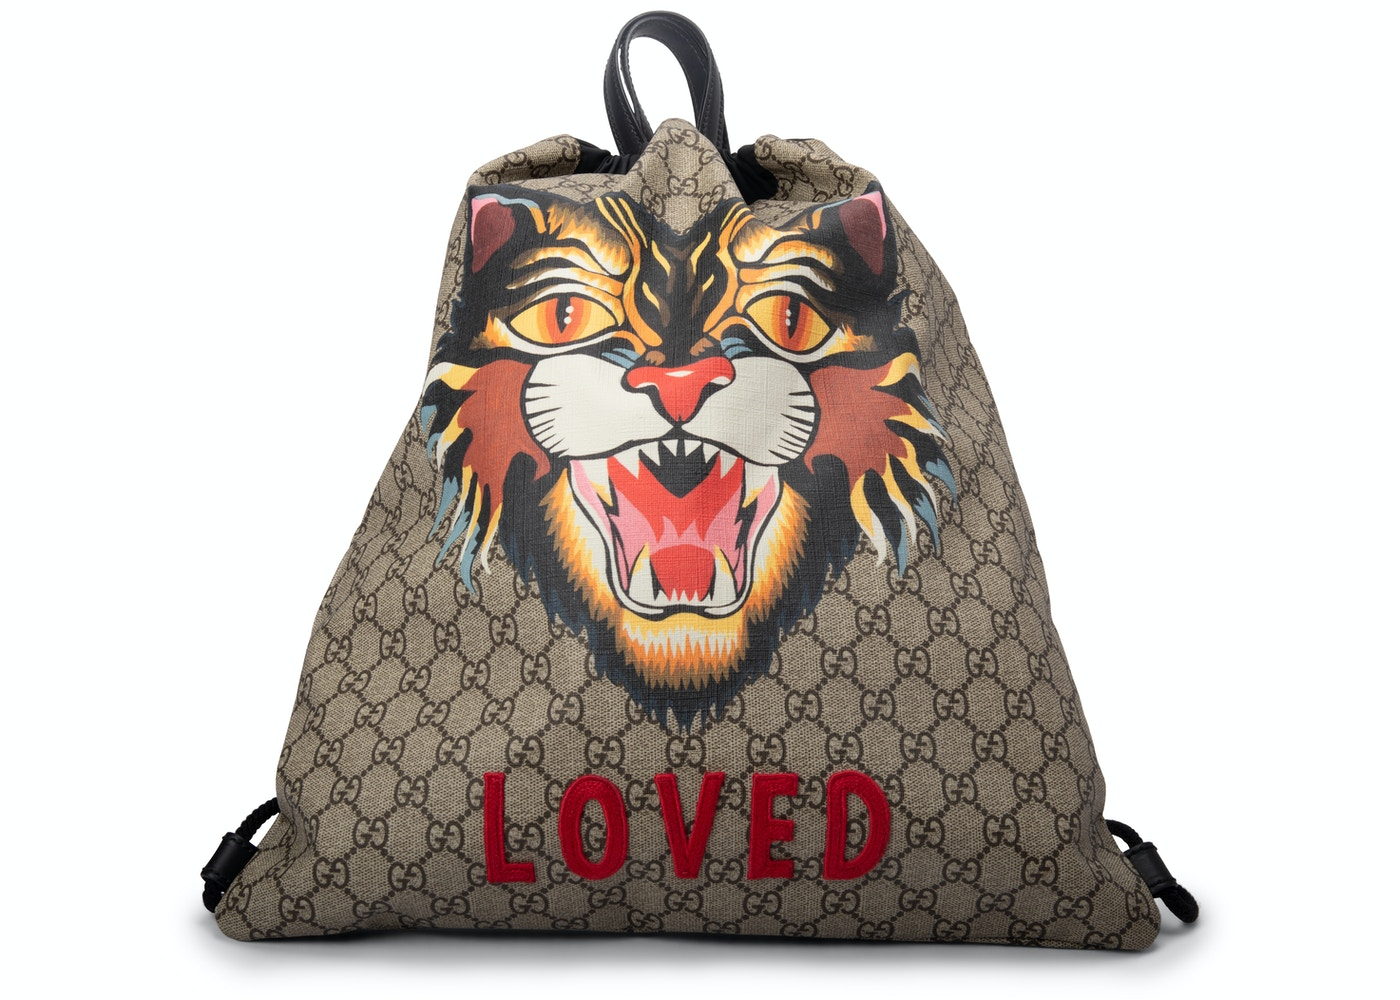 292163baf339 Gucci GG Supreme Soft Drawstring Backpack Angry Cat Print Beige Black